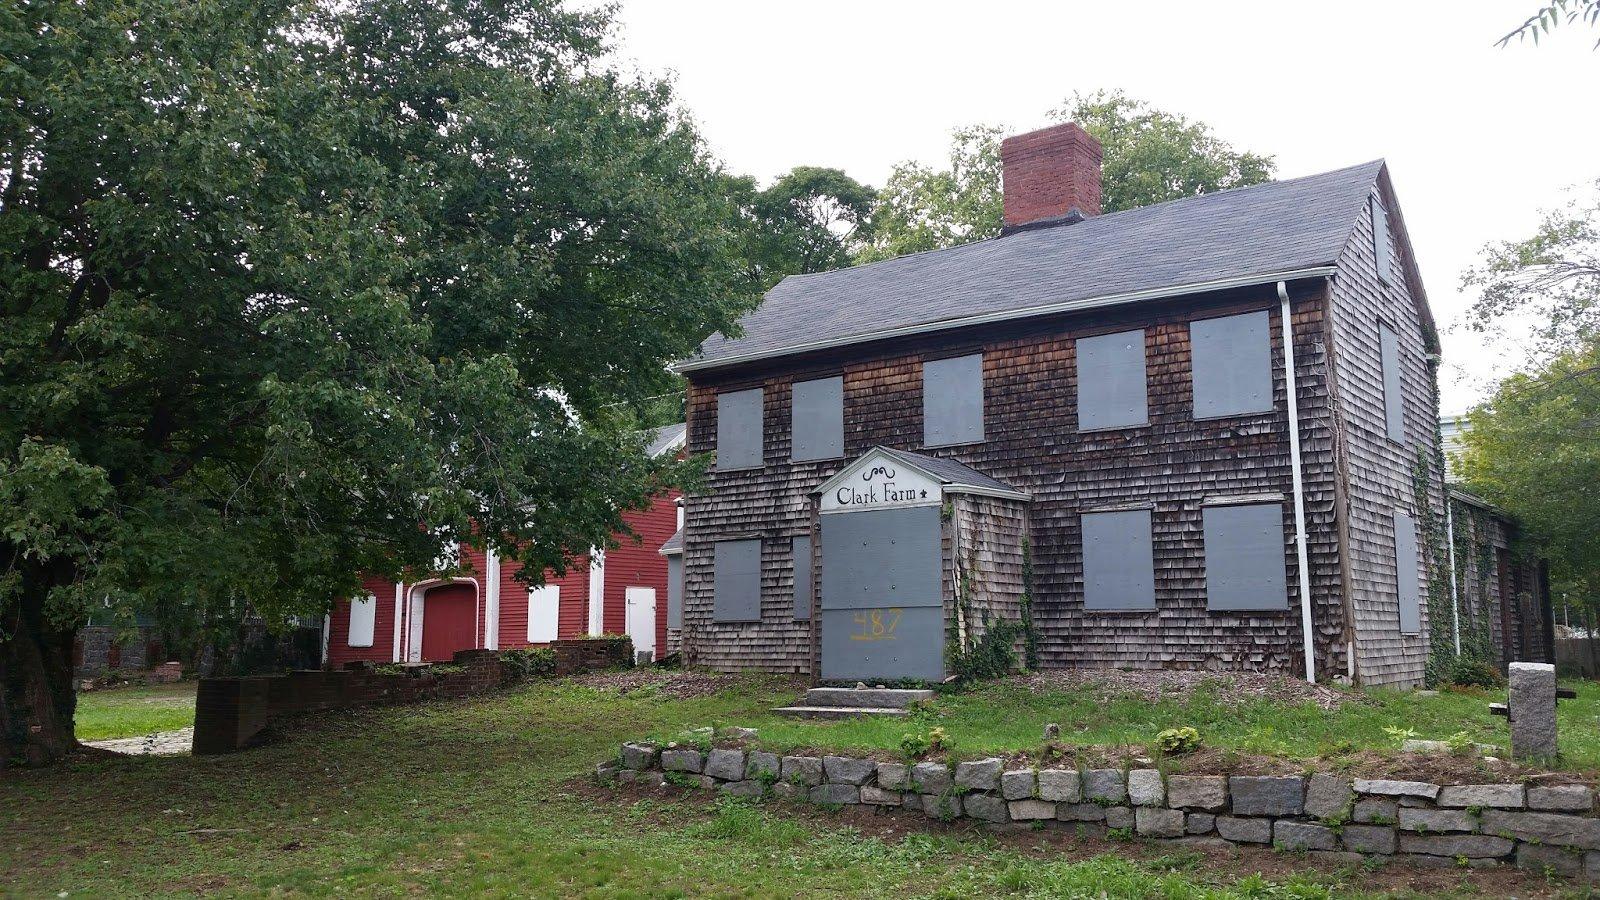 Exterior of Fowler Clark Epstein Farm